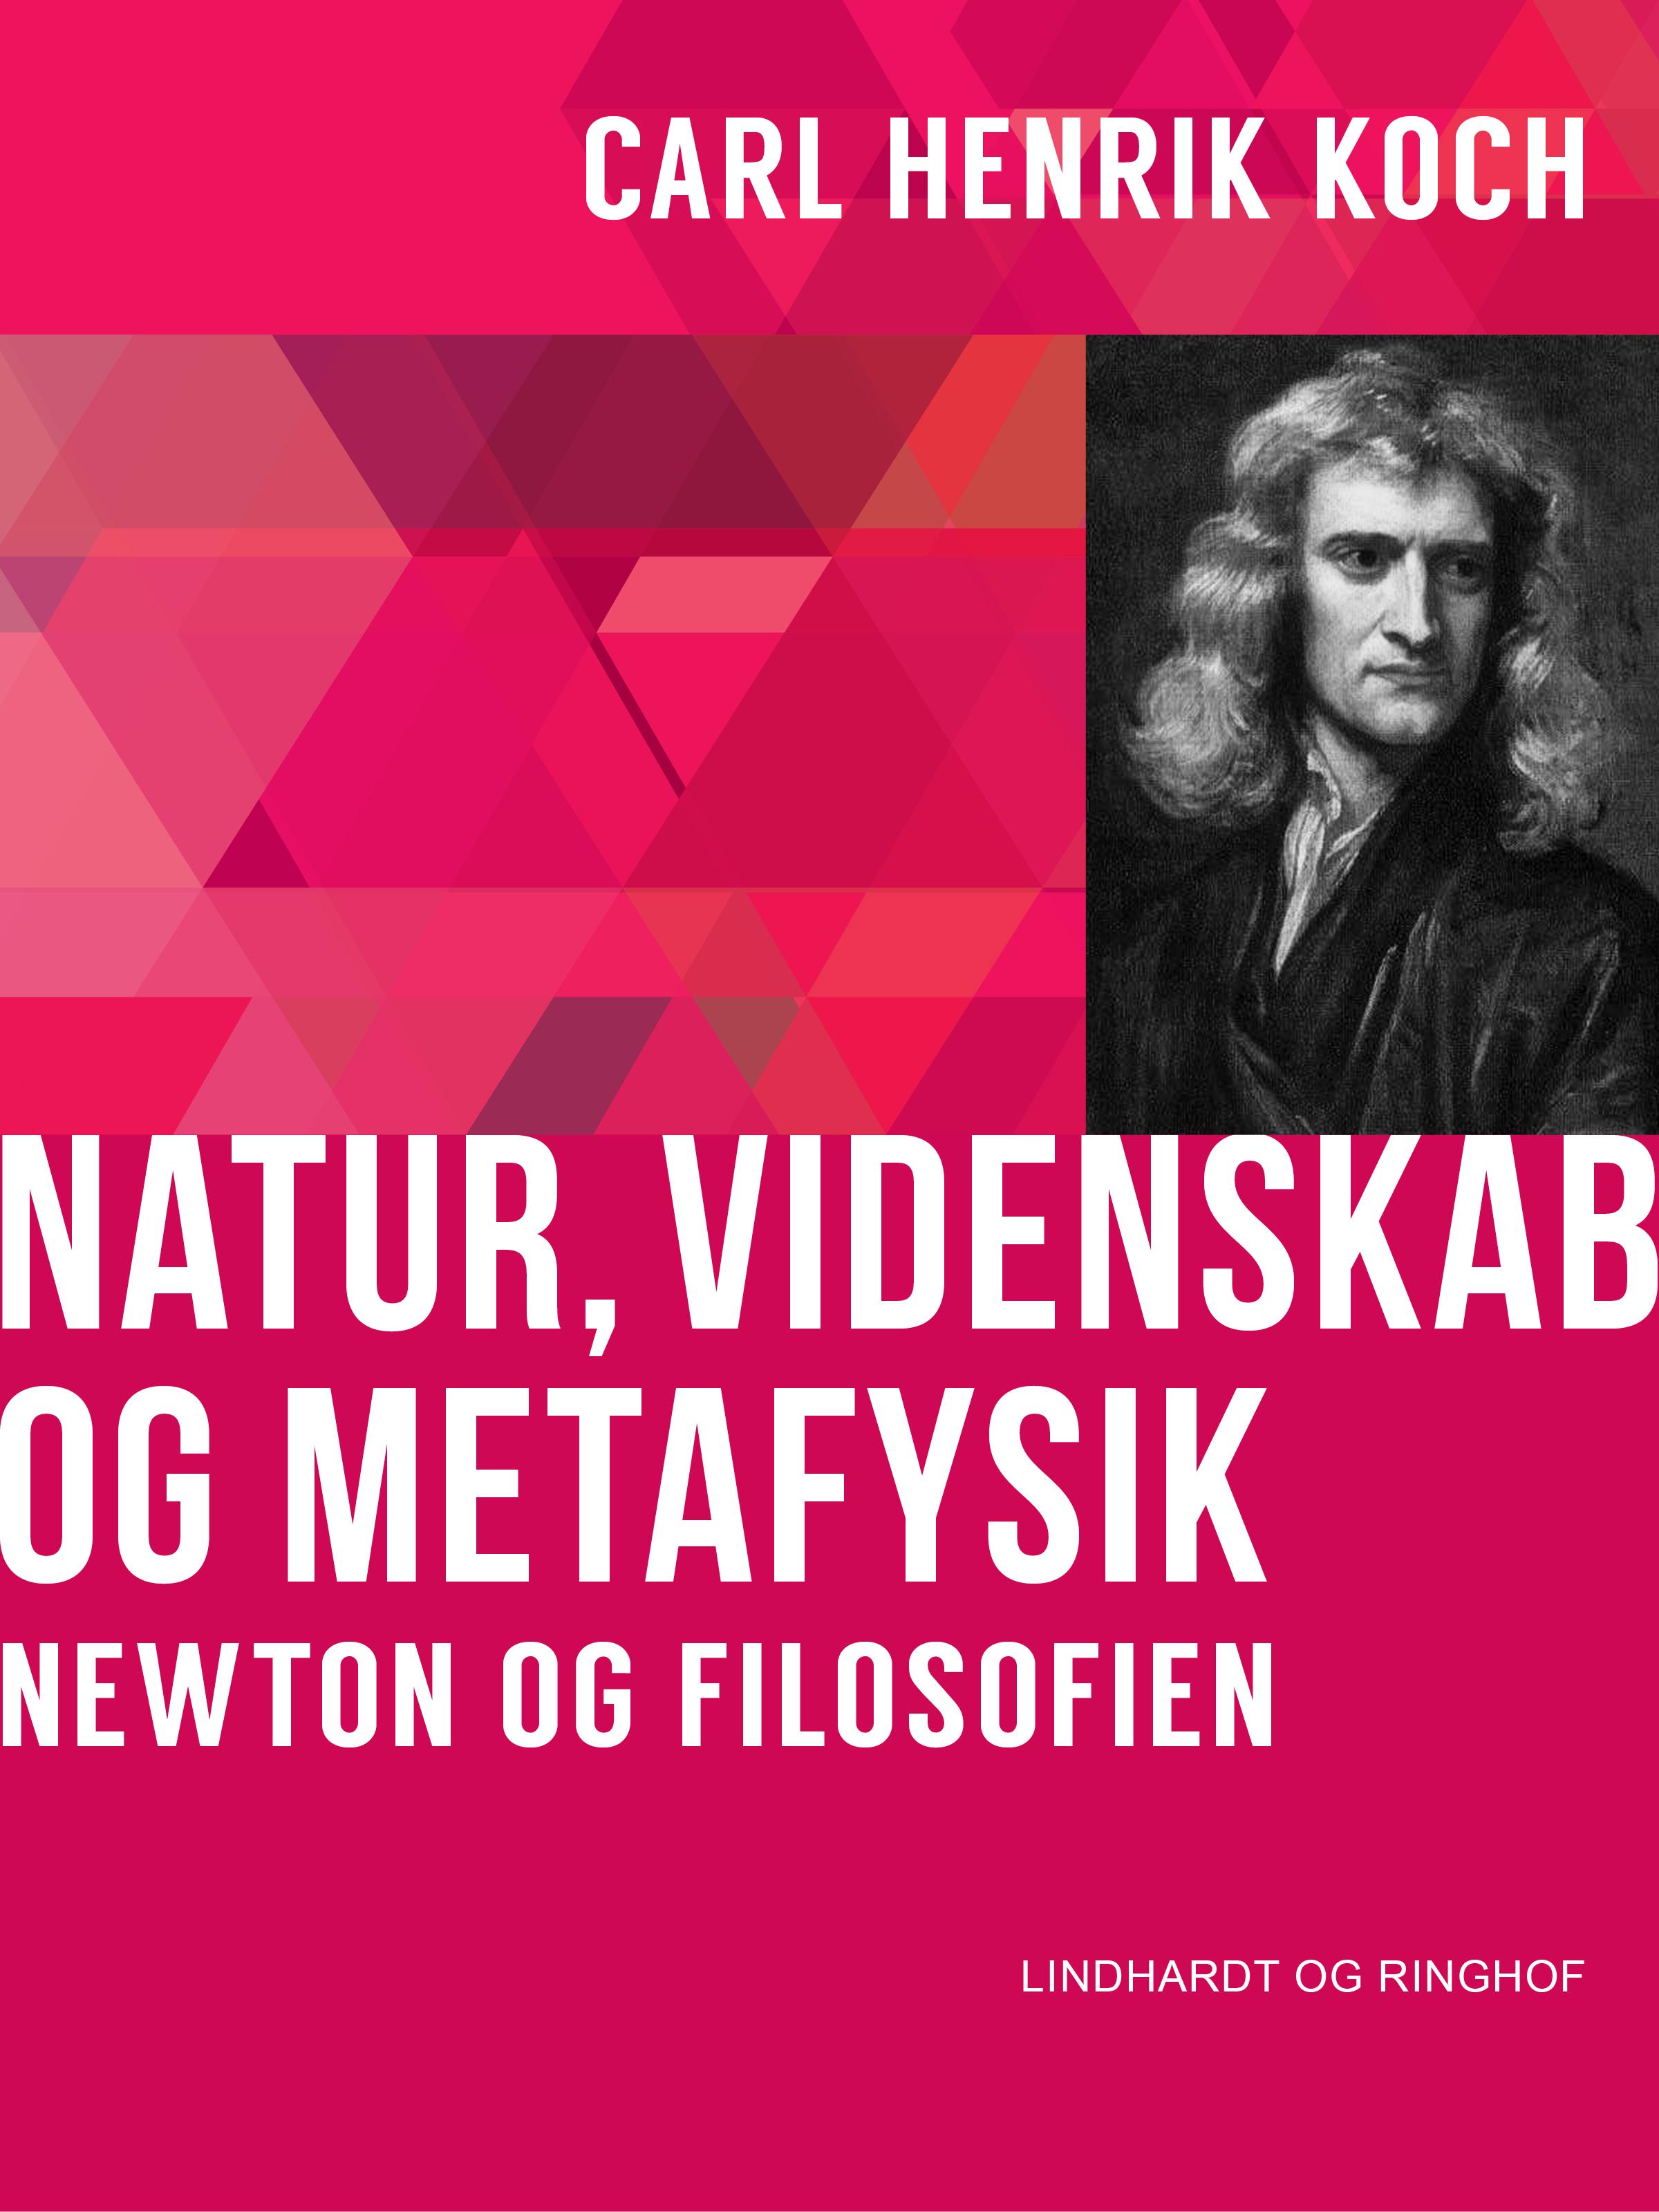 N/A Natur, videnskab og metafysik. newton og filosofien - e-bog på bog & mystik